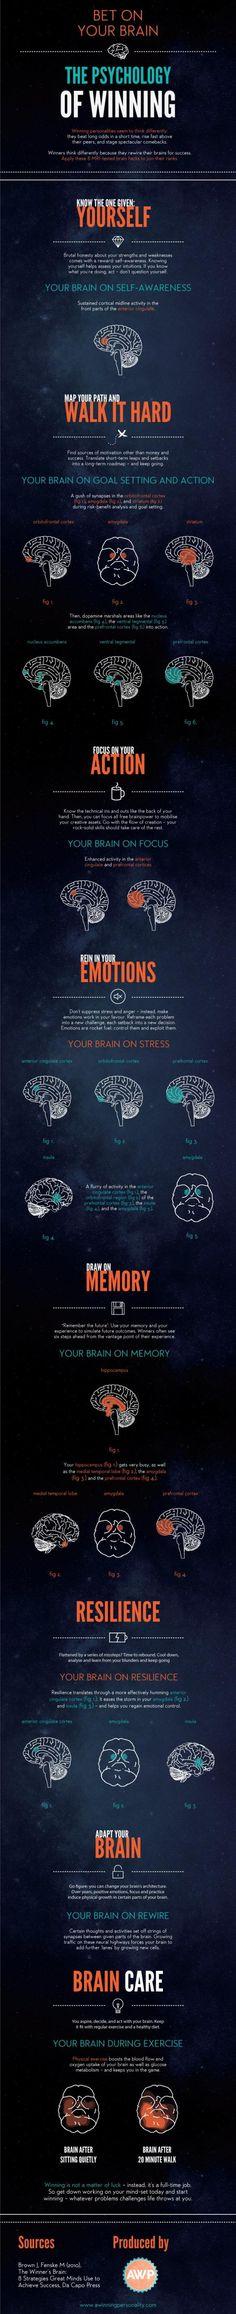 The psychology of winning (Infographic)   ScienceDump